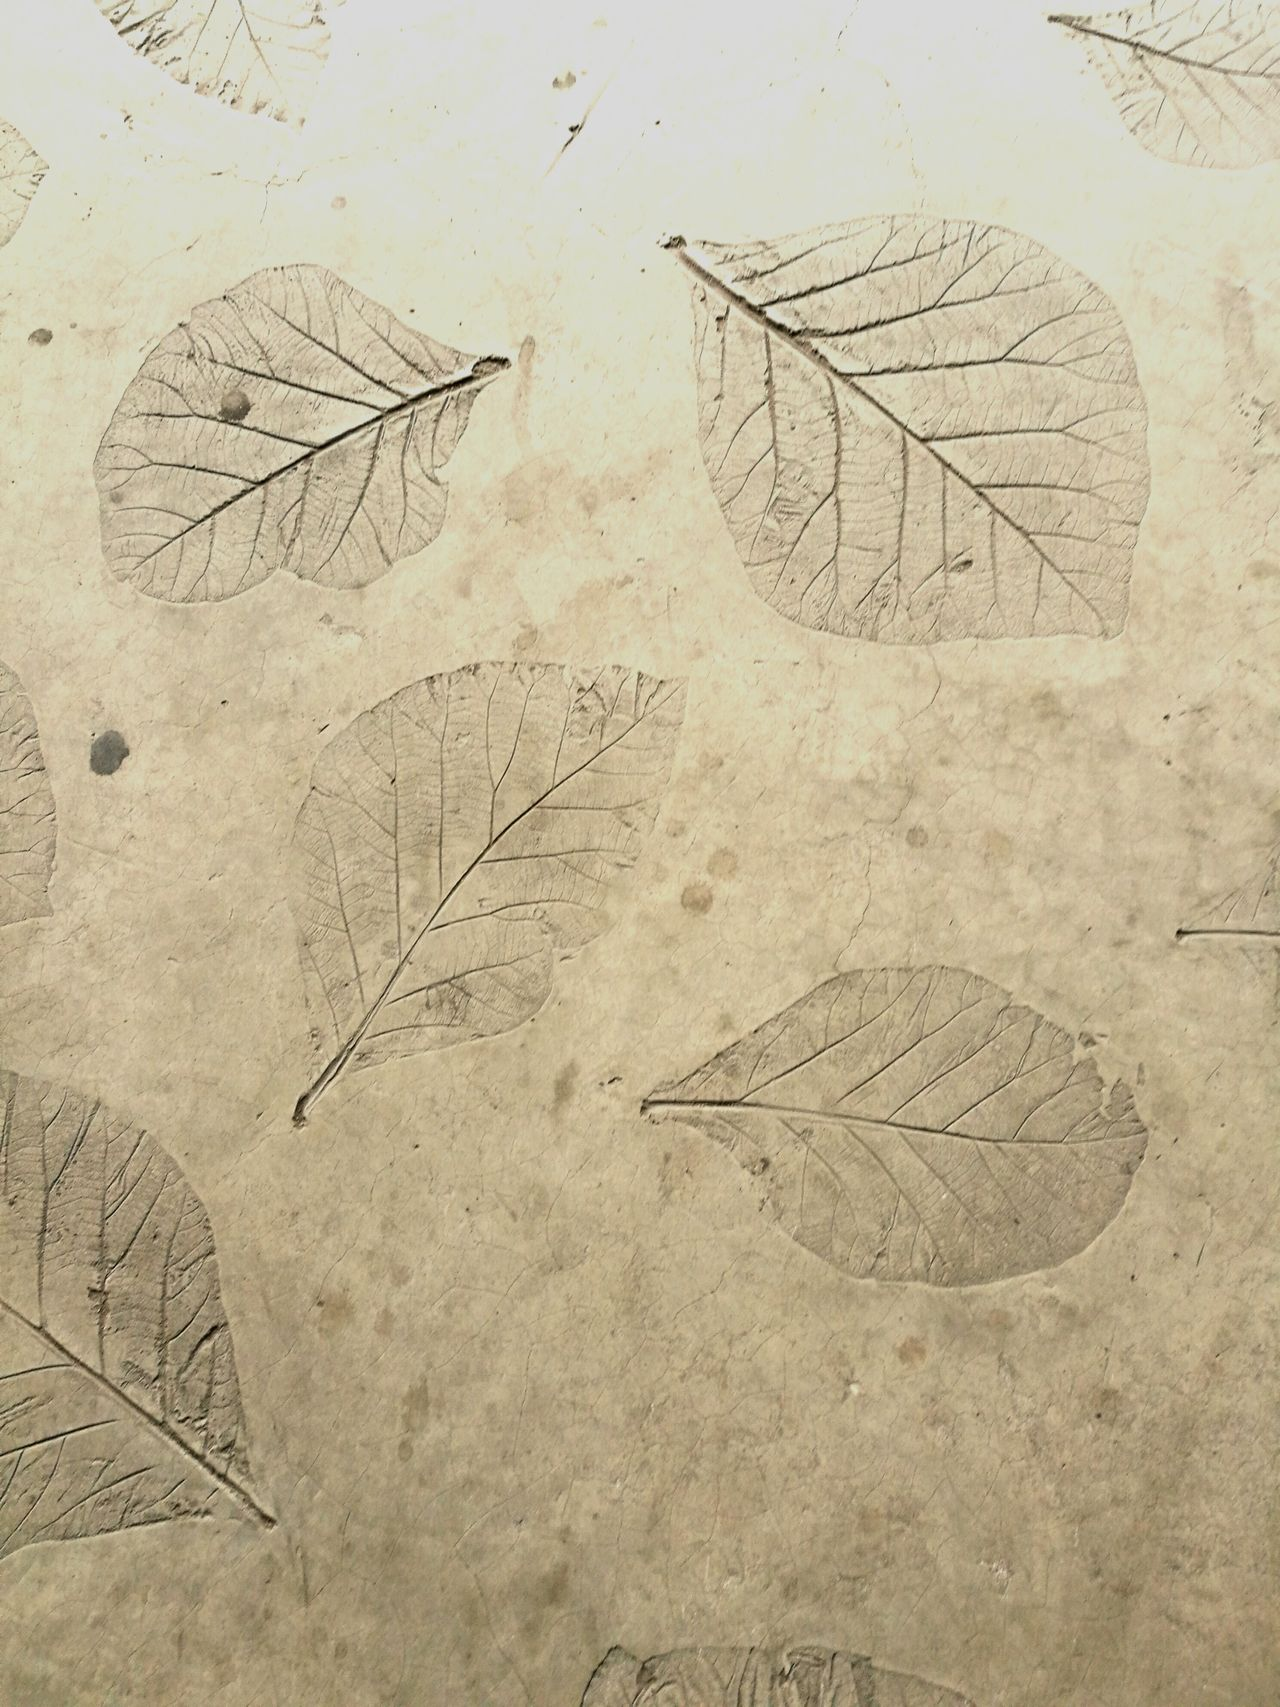 Leaves stamp on concrete floor Pattern Close-up Leaves Leaf Stamp Concrete Floor Concrete Texture Nature Floor Flooring Grey